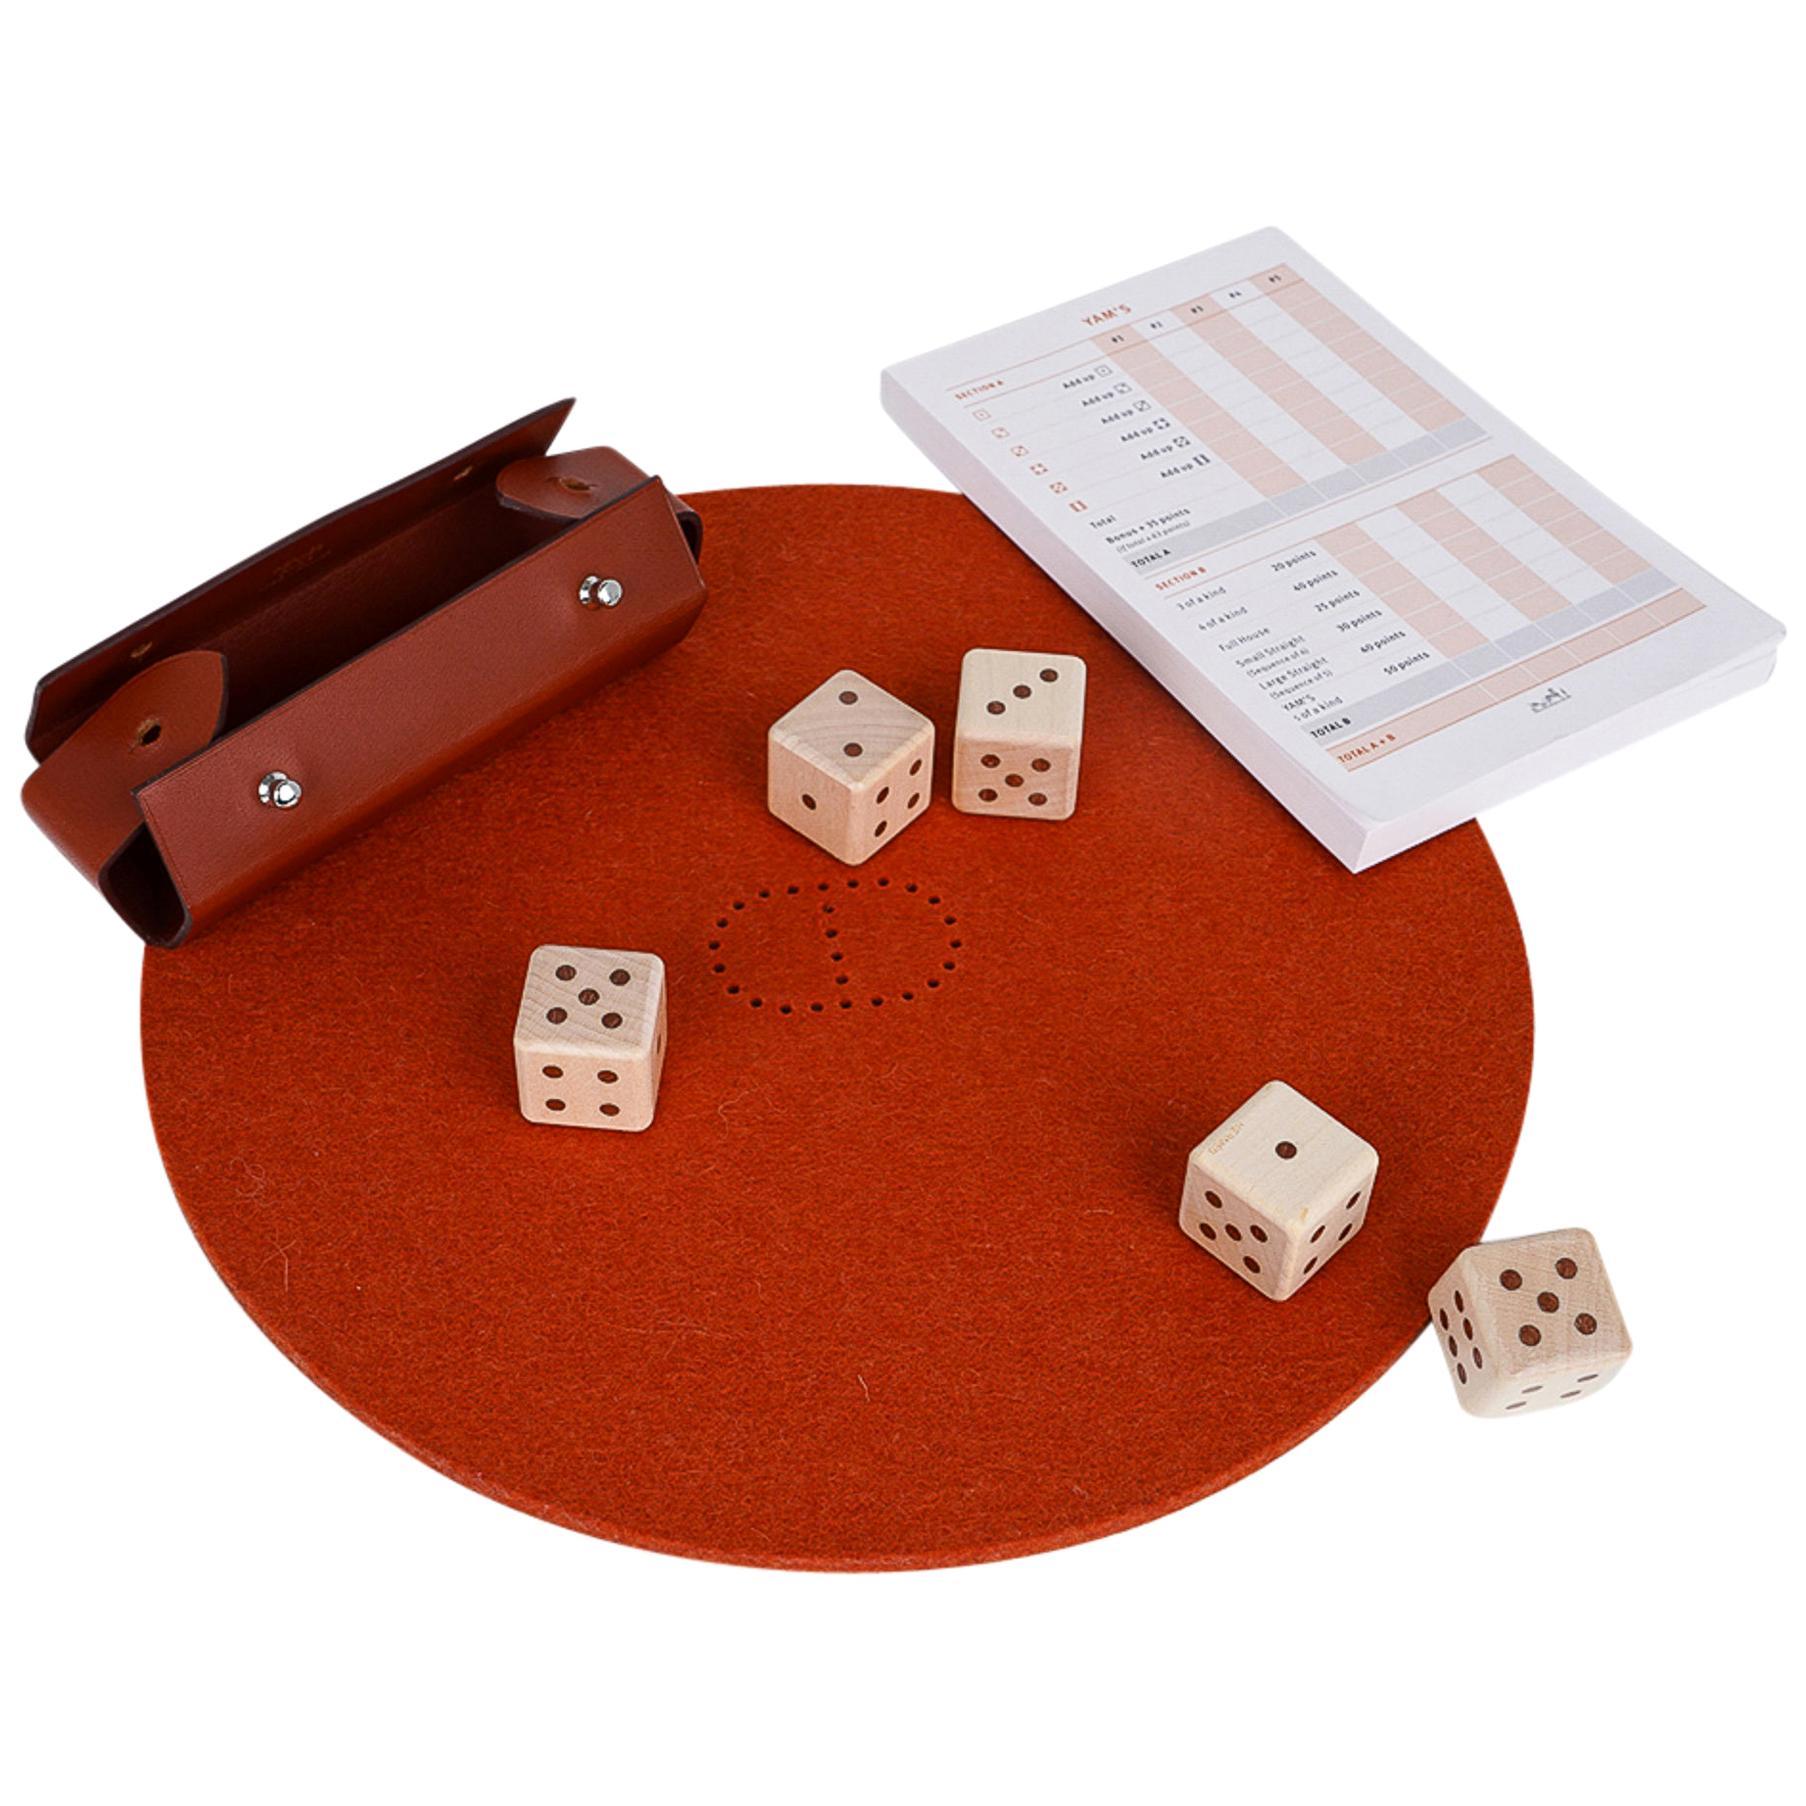 Hermes Declick Dice Game New w/ Box